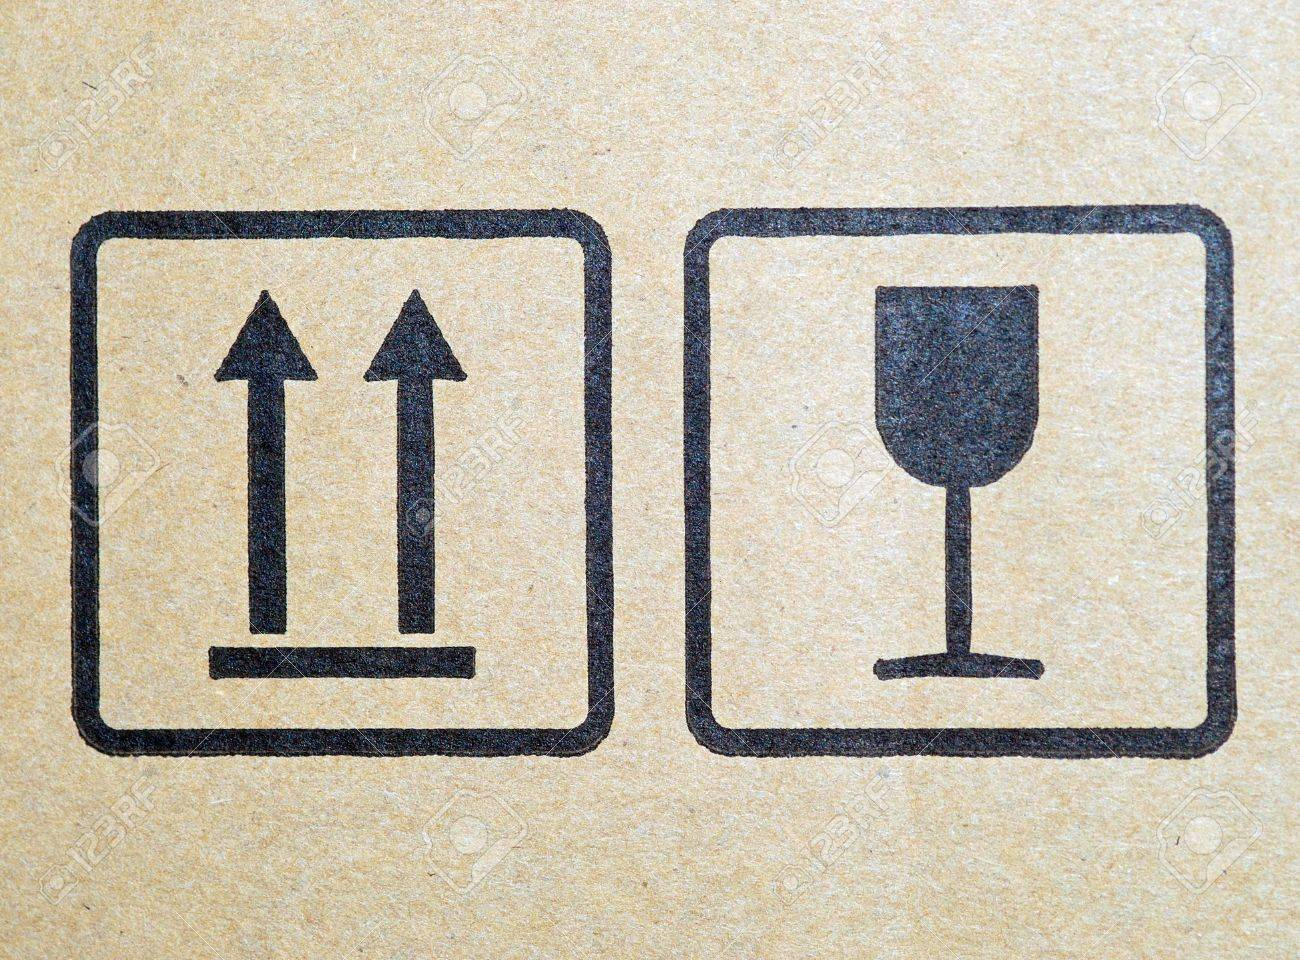 Carton Fragile Box Markings